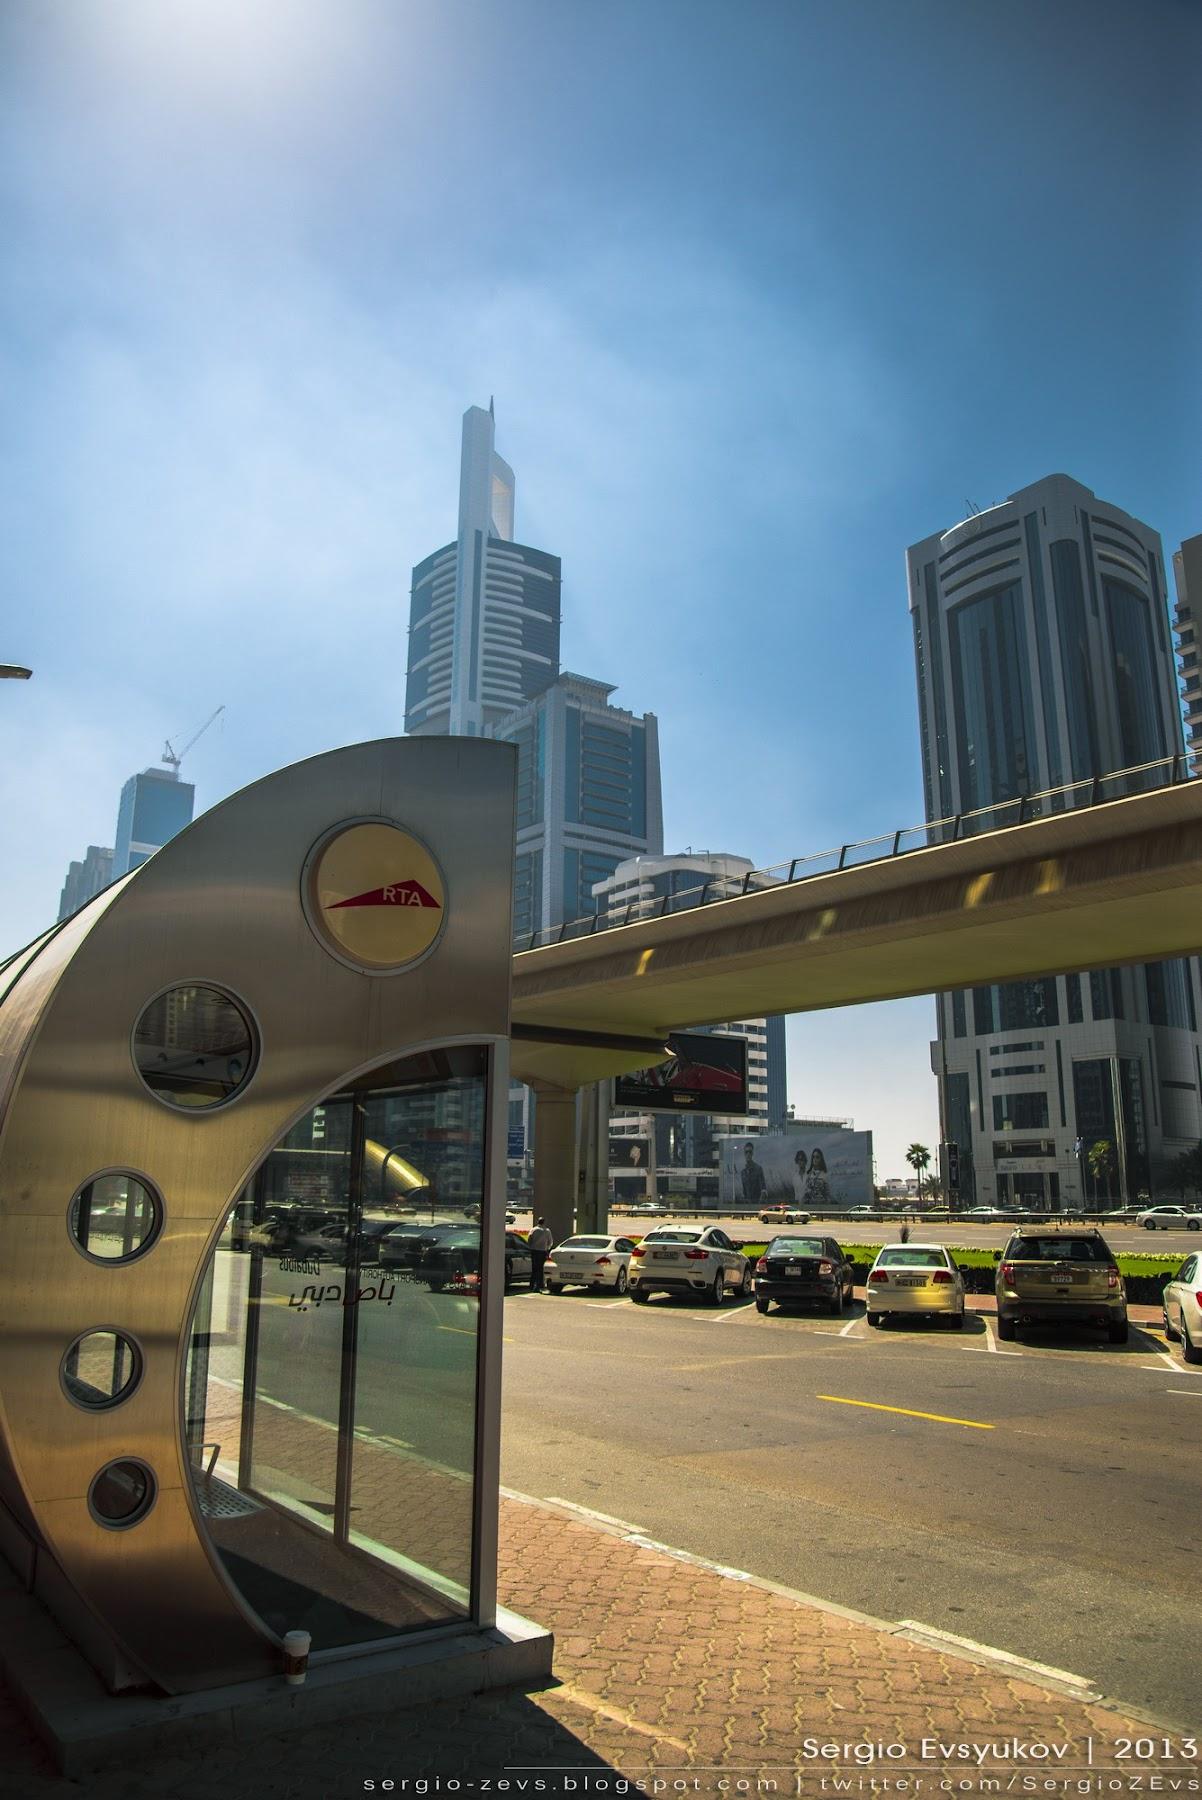 Air-conditioned bus stop in Dubai